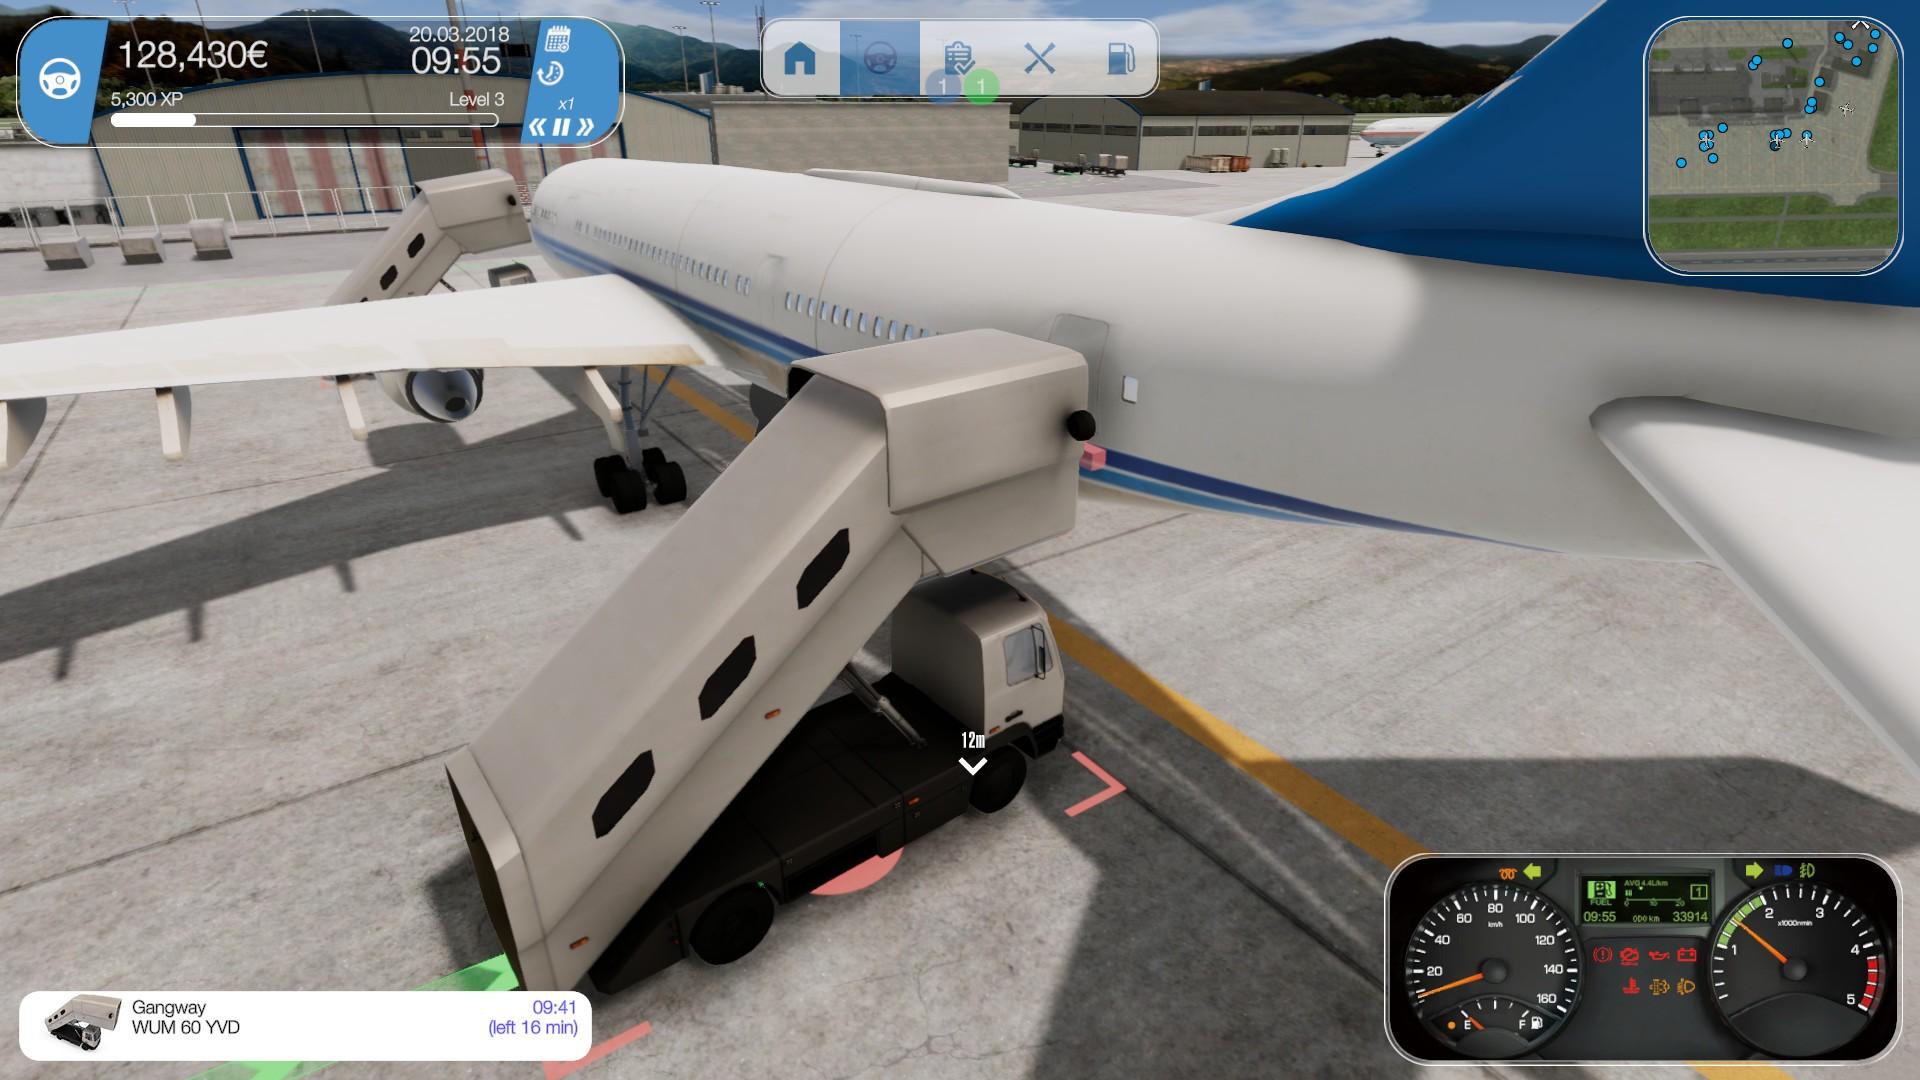 comprar airport simulator 2019 steam. Black Bedroom Furniture Sets. Home Design Ideas